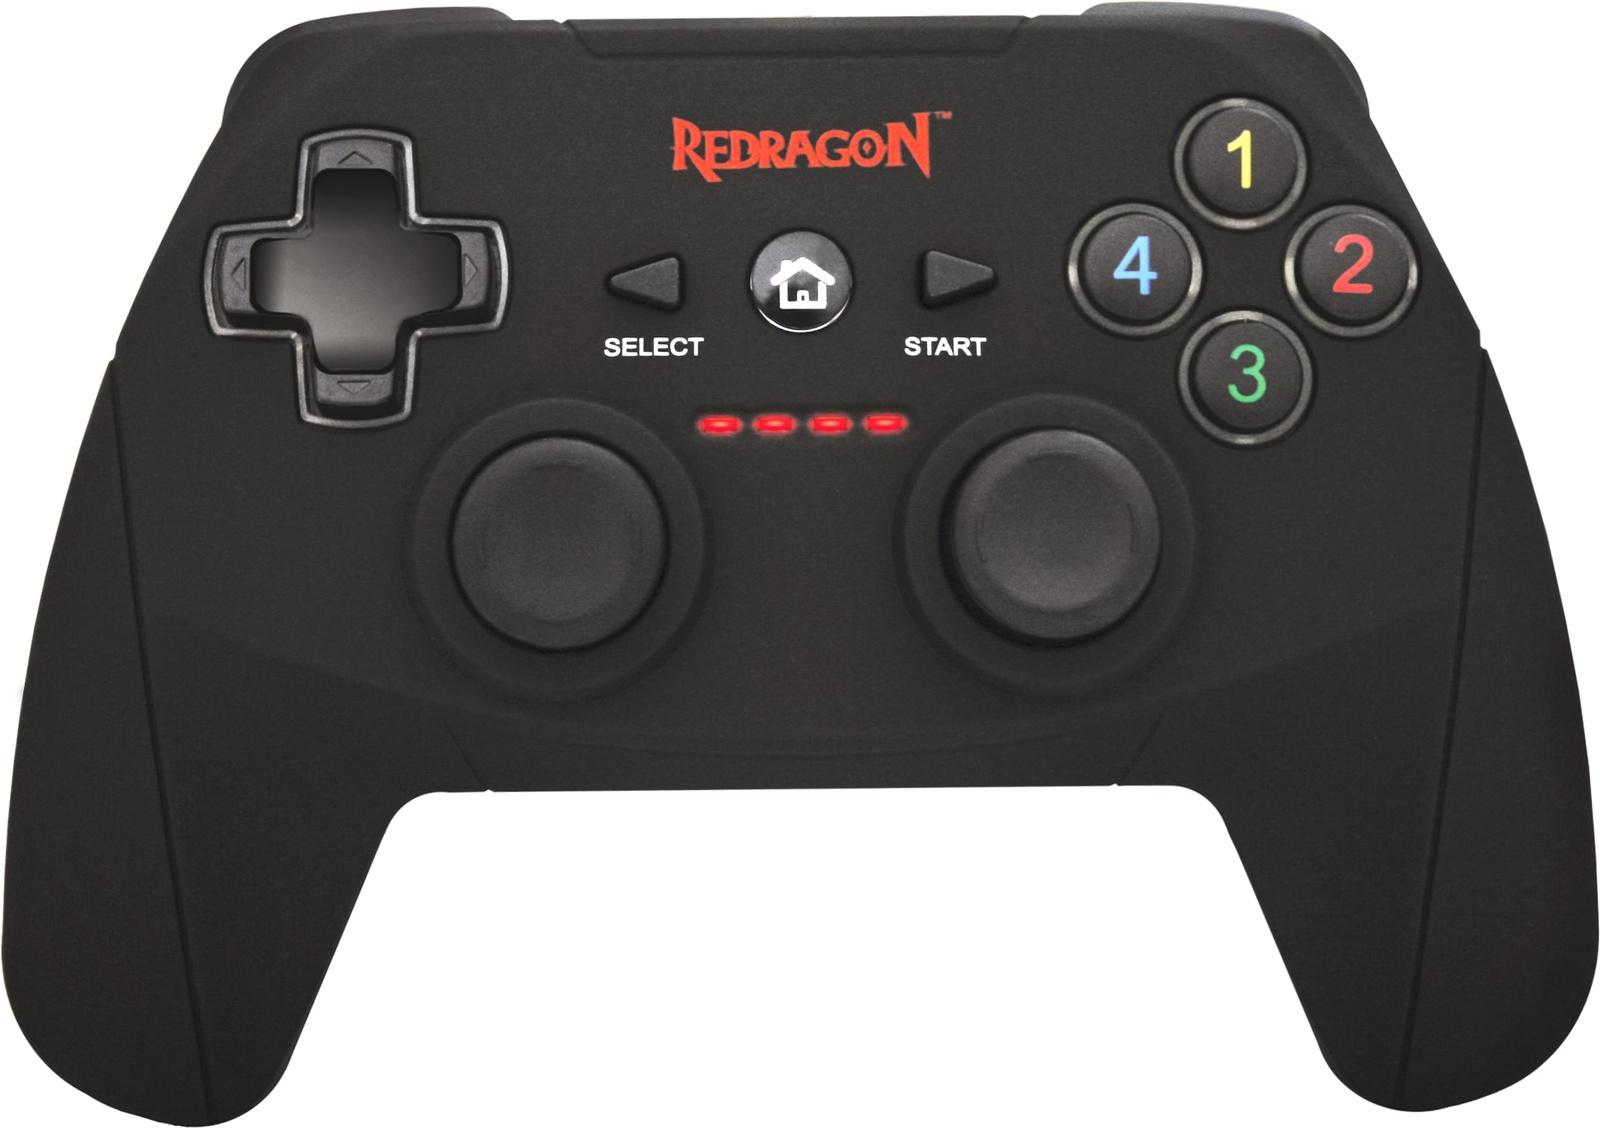 Геймпад Redragon Harrow USB Xinput-PS3, радио, Li-Ion, 64230, черный геймпад redragon harrow usb xinput ps3 64230